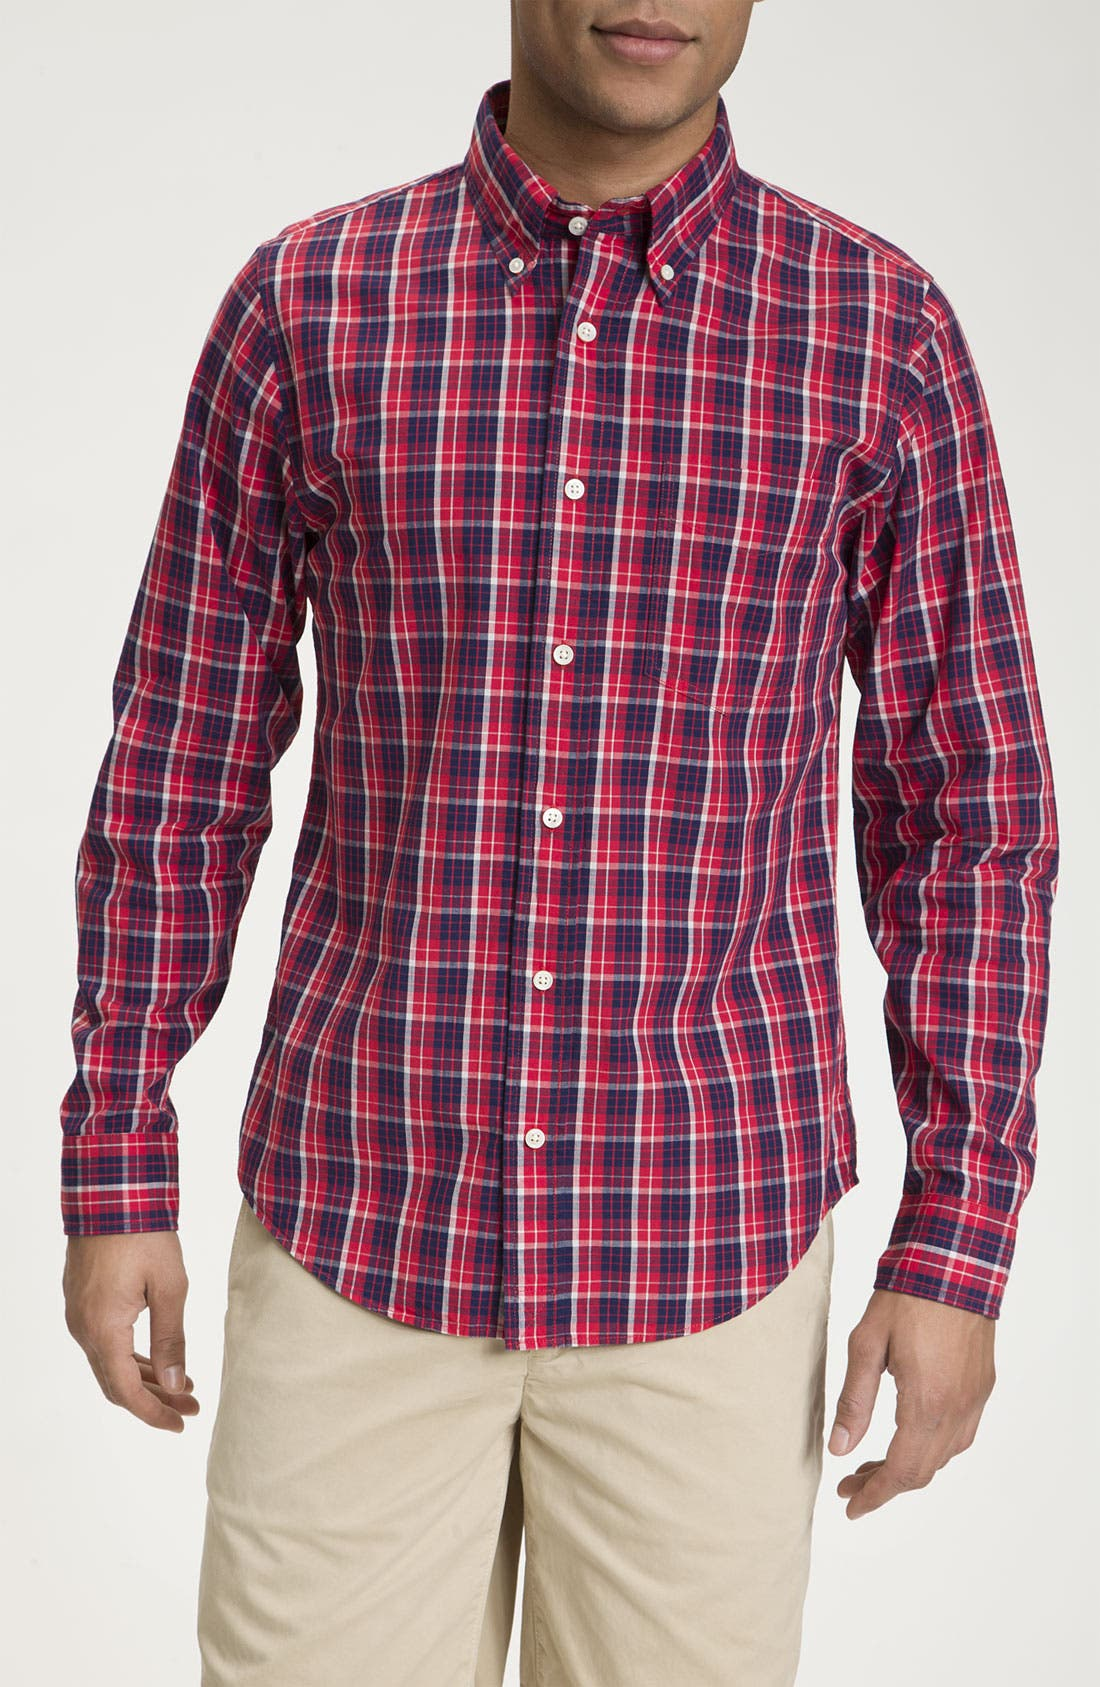 Alternate Image 1 Selected - Jack Spade 'Adler' Plaid Woven Shirt